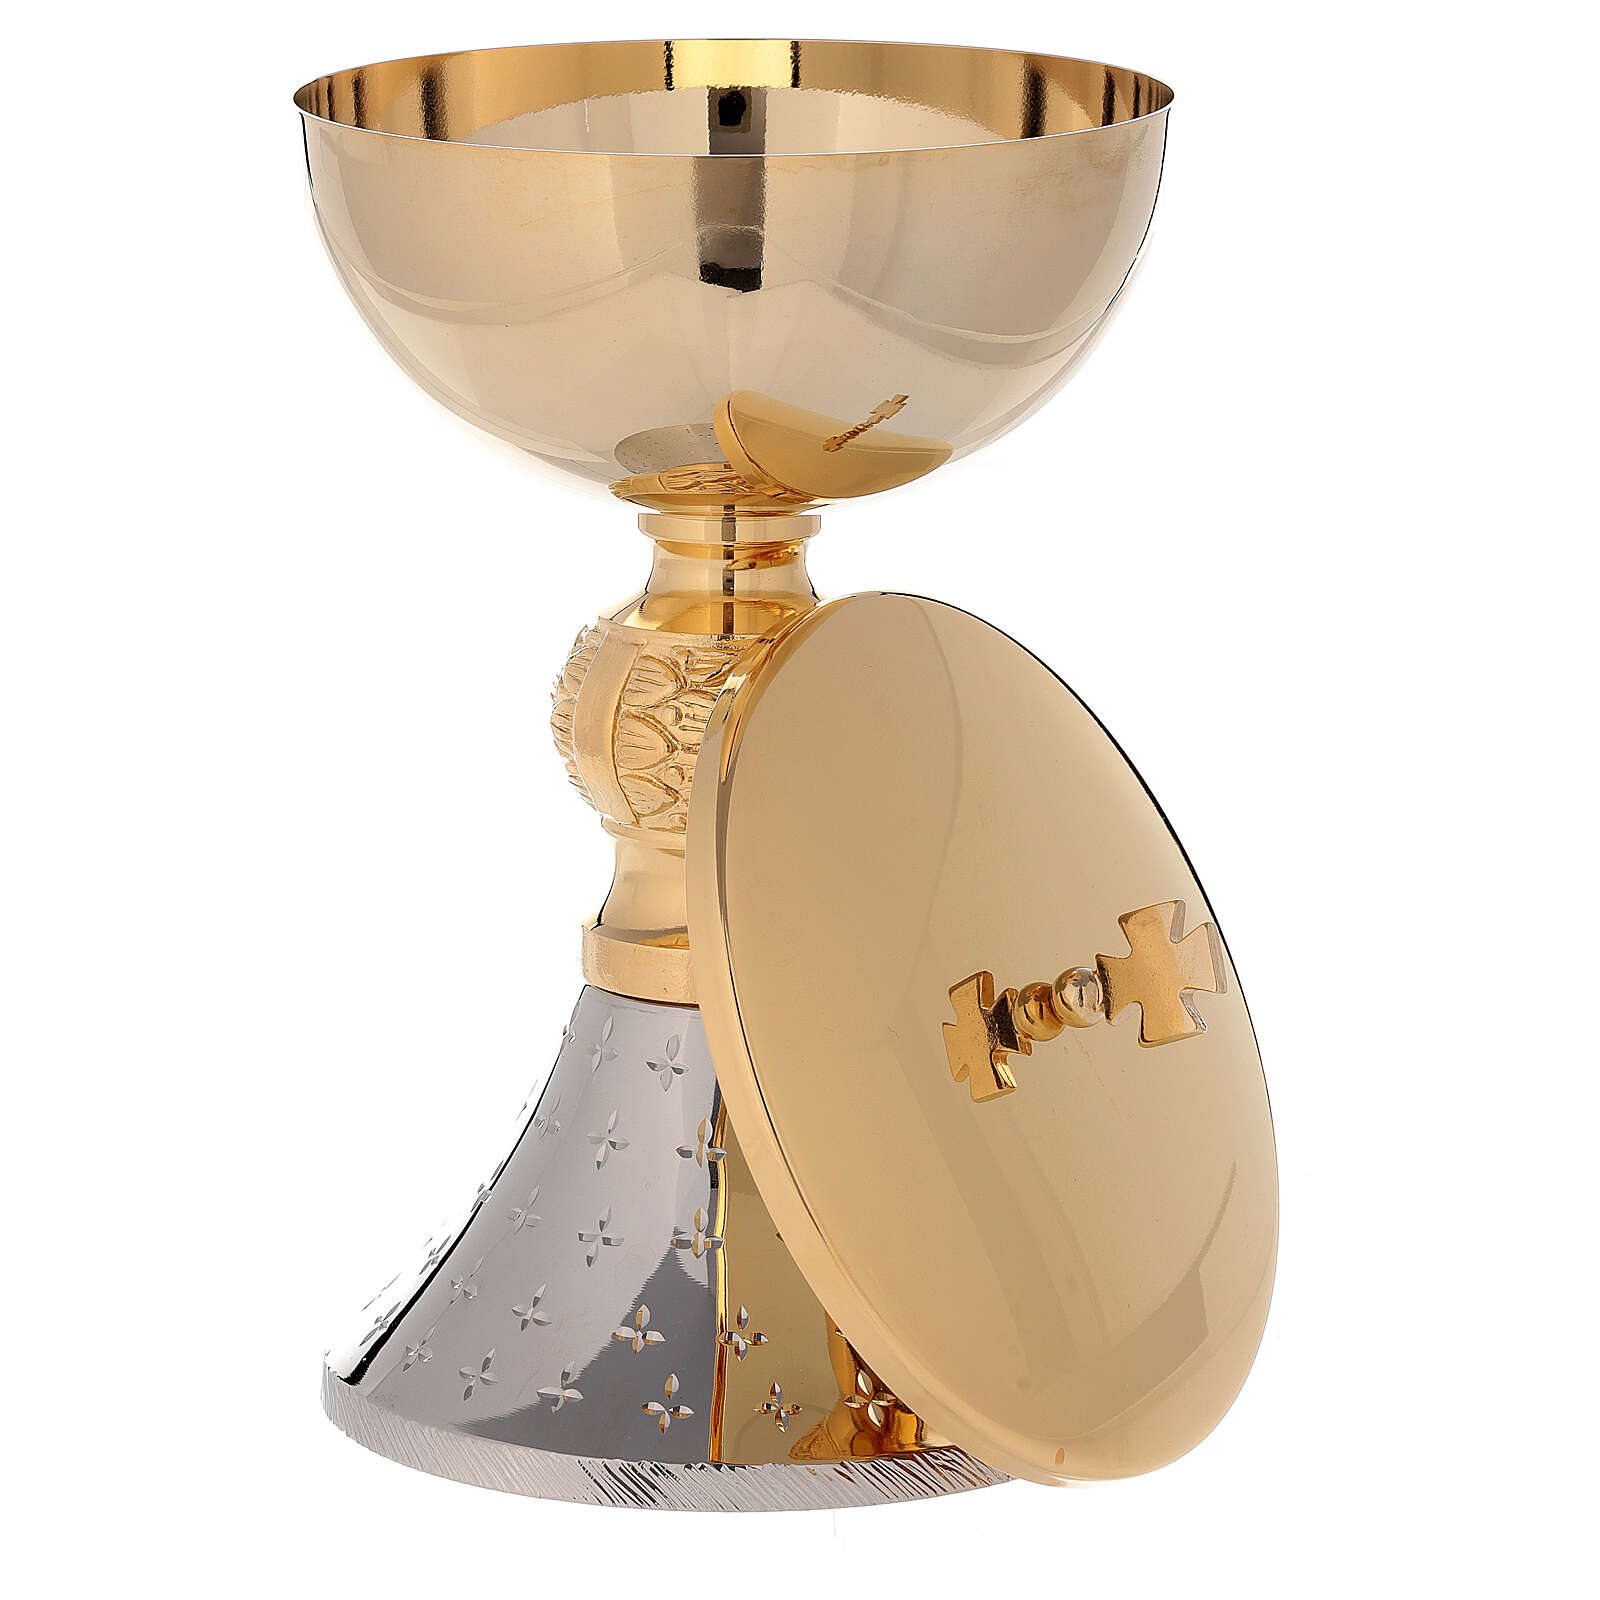 Chalice and ciborium 24-karat bicolored brass with diamond finished base 4